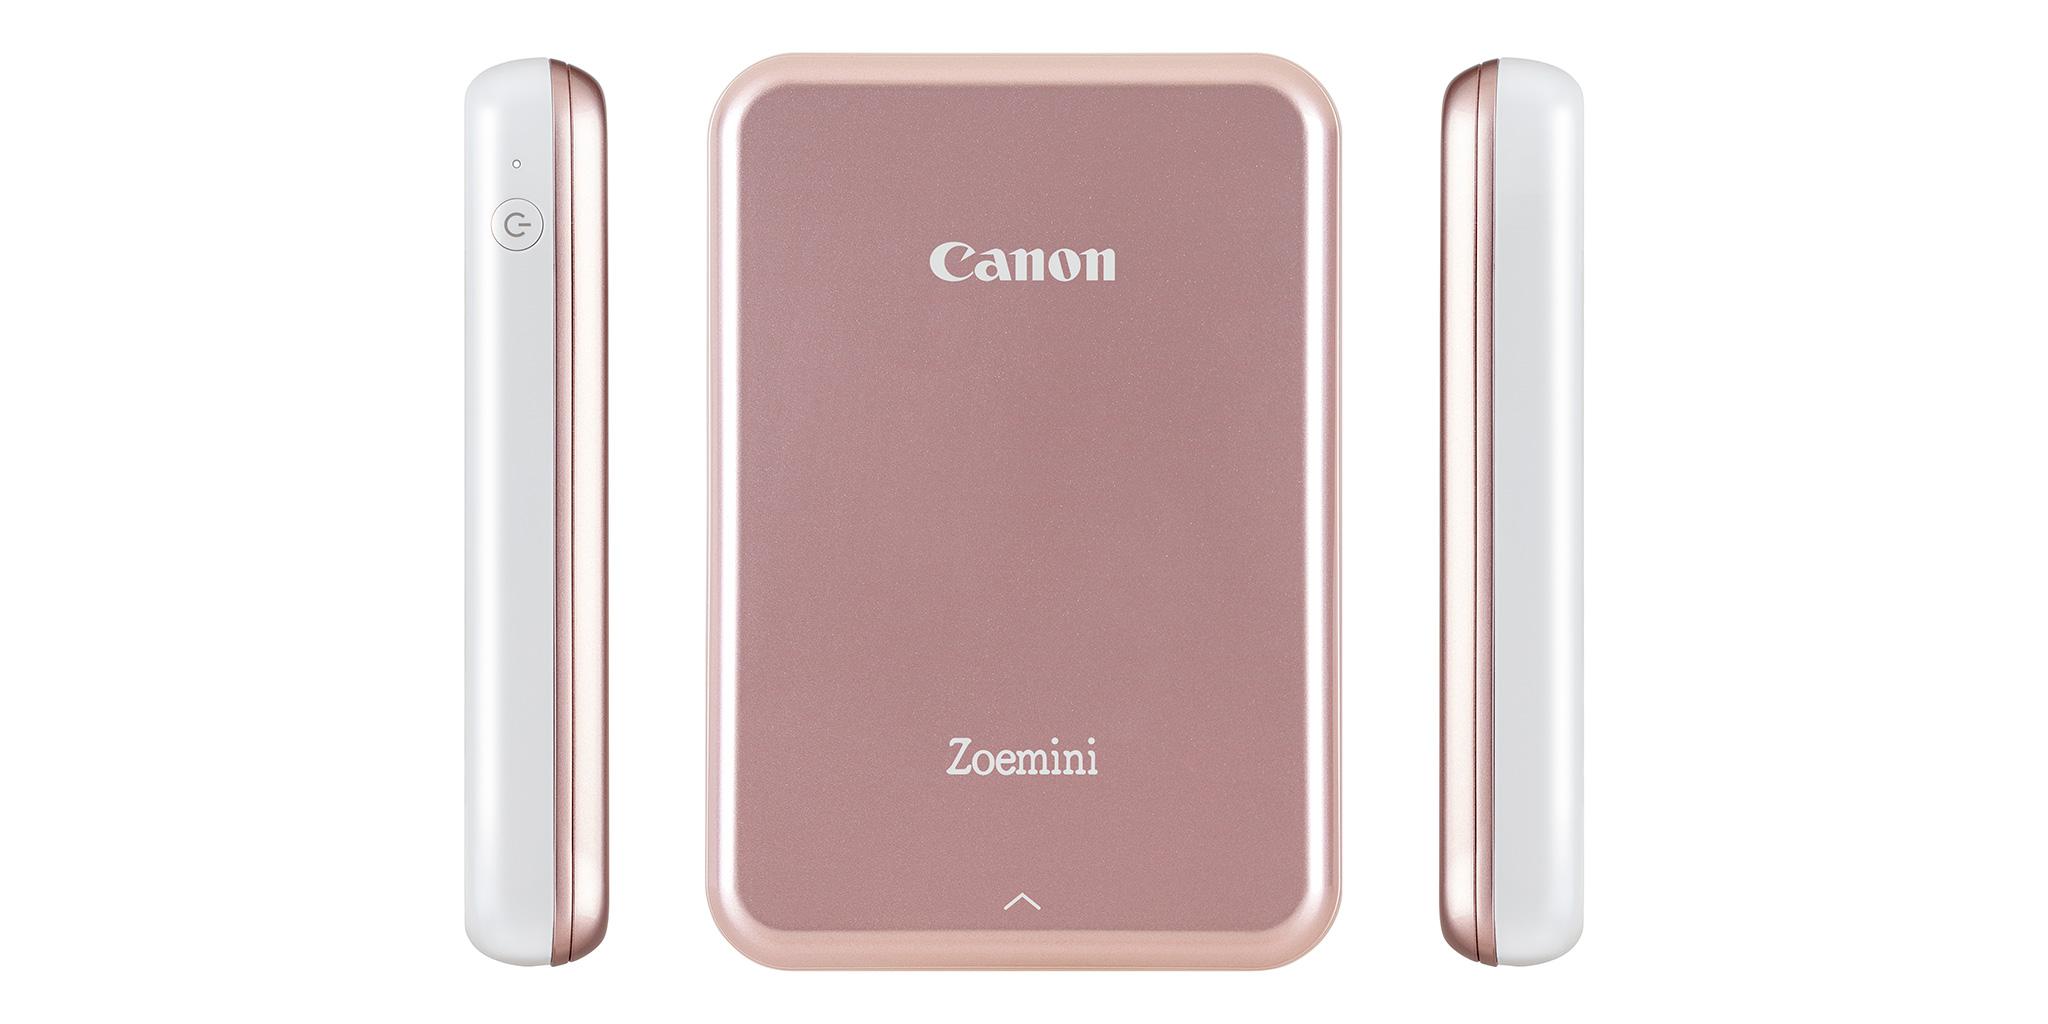 CameraTinhte_Canon-Zoemini_Hong.jpg